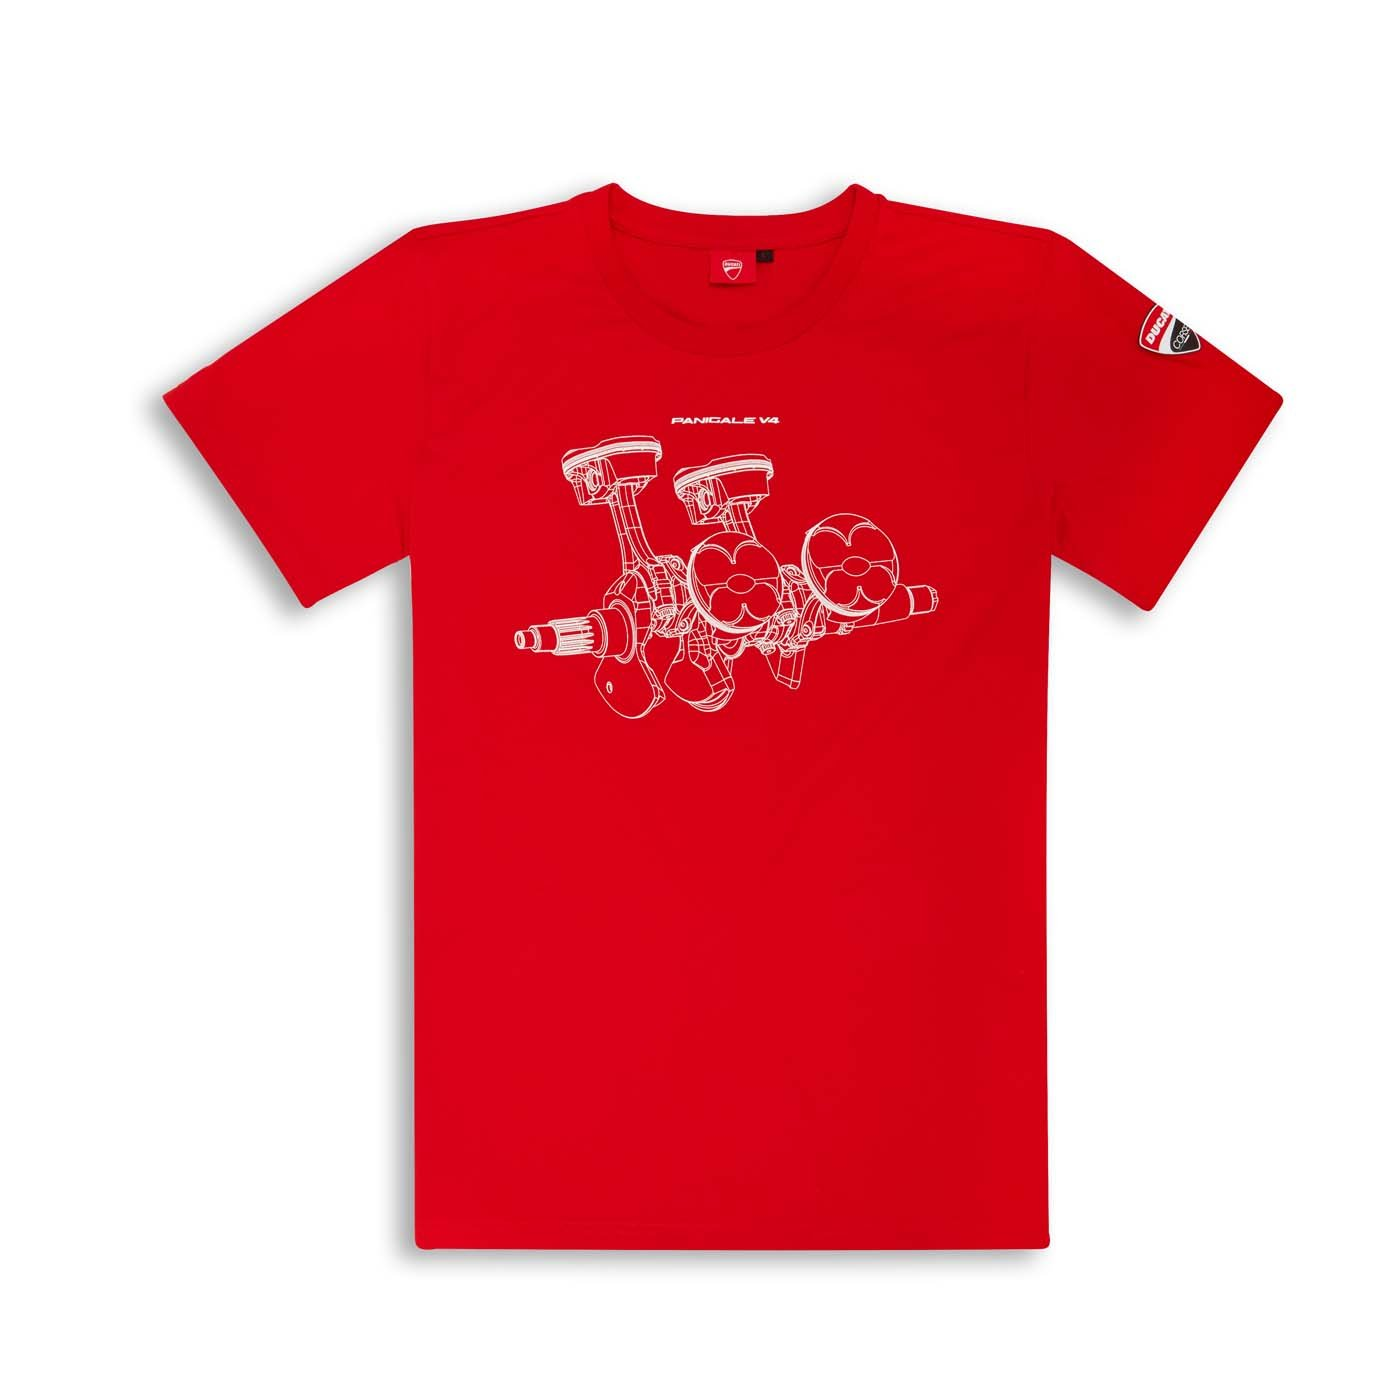 Ducati V4 Panigale T-Shirt - Size Medium